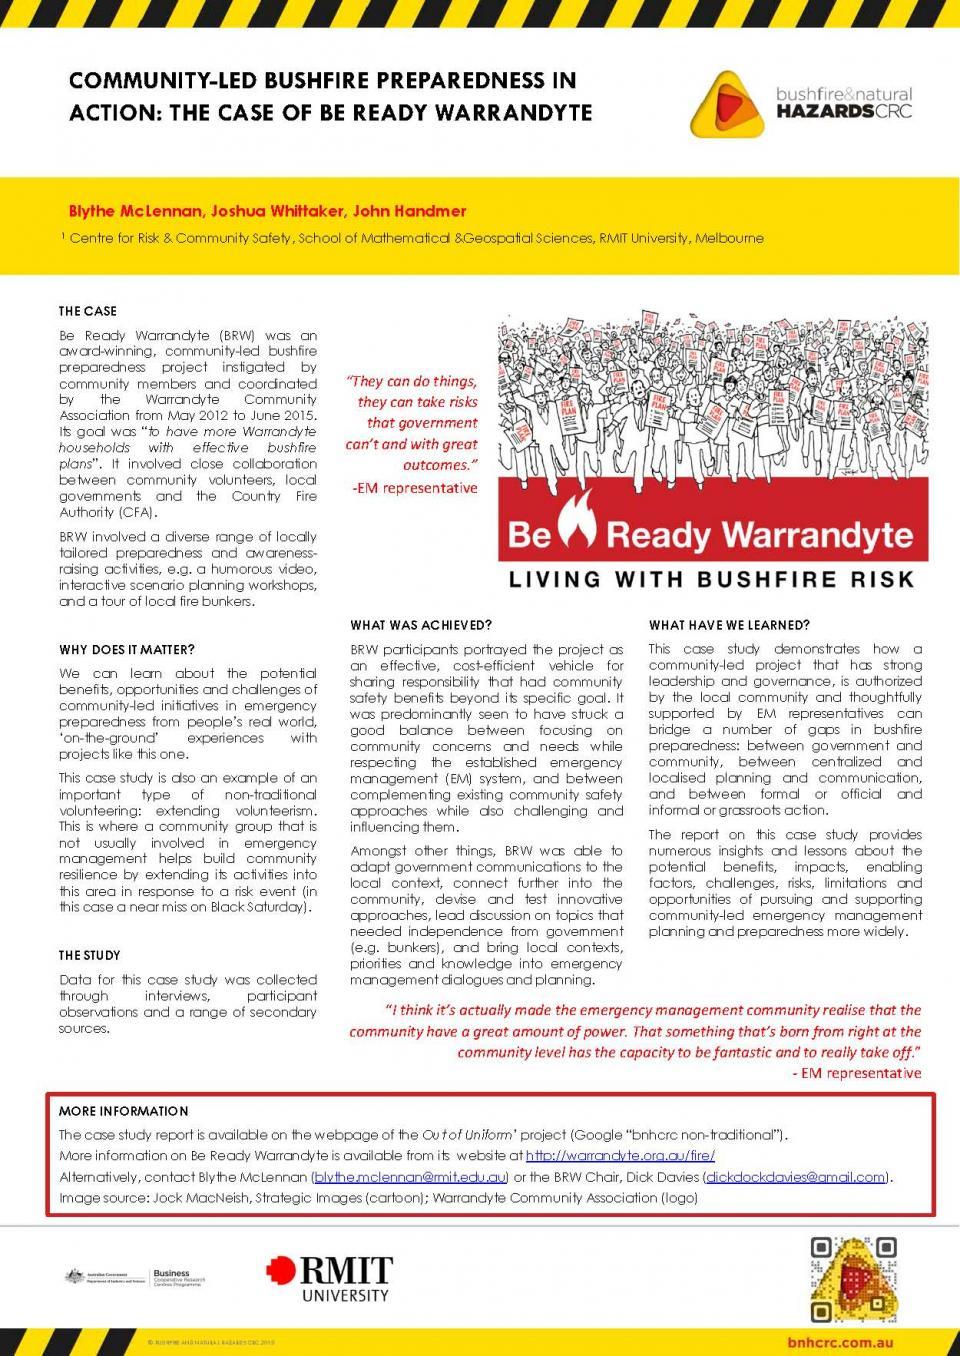 Community-Led Bushfire Preparedness in Action: The Case of Be Ready Warrandyte